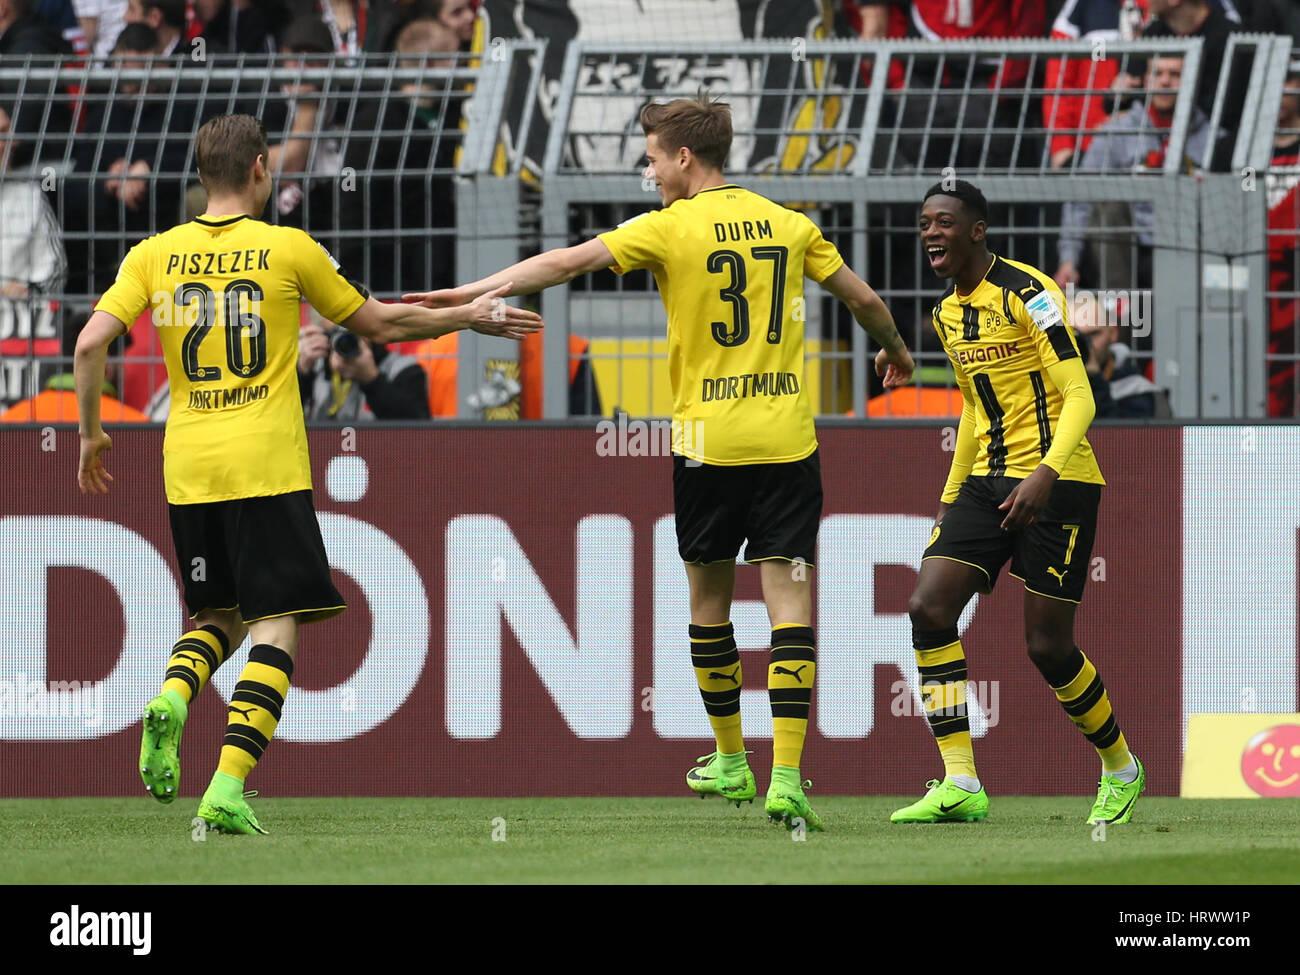 Dortmund's goal scorer Ousmane Dembele cheers with team mates Lukasz Piszczek (l) snd Erik Durm after scoring - Stock Image